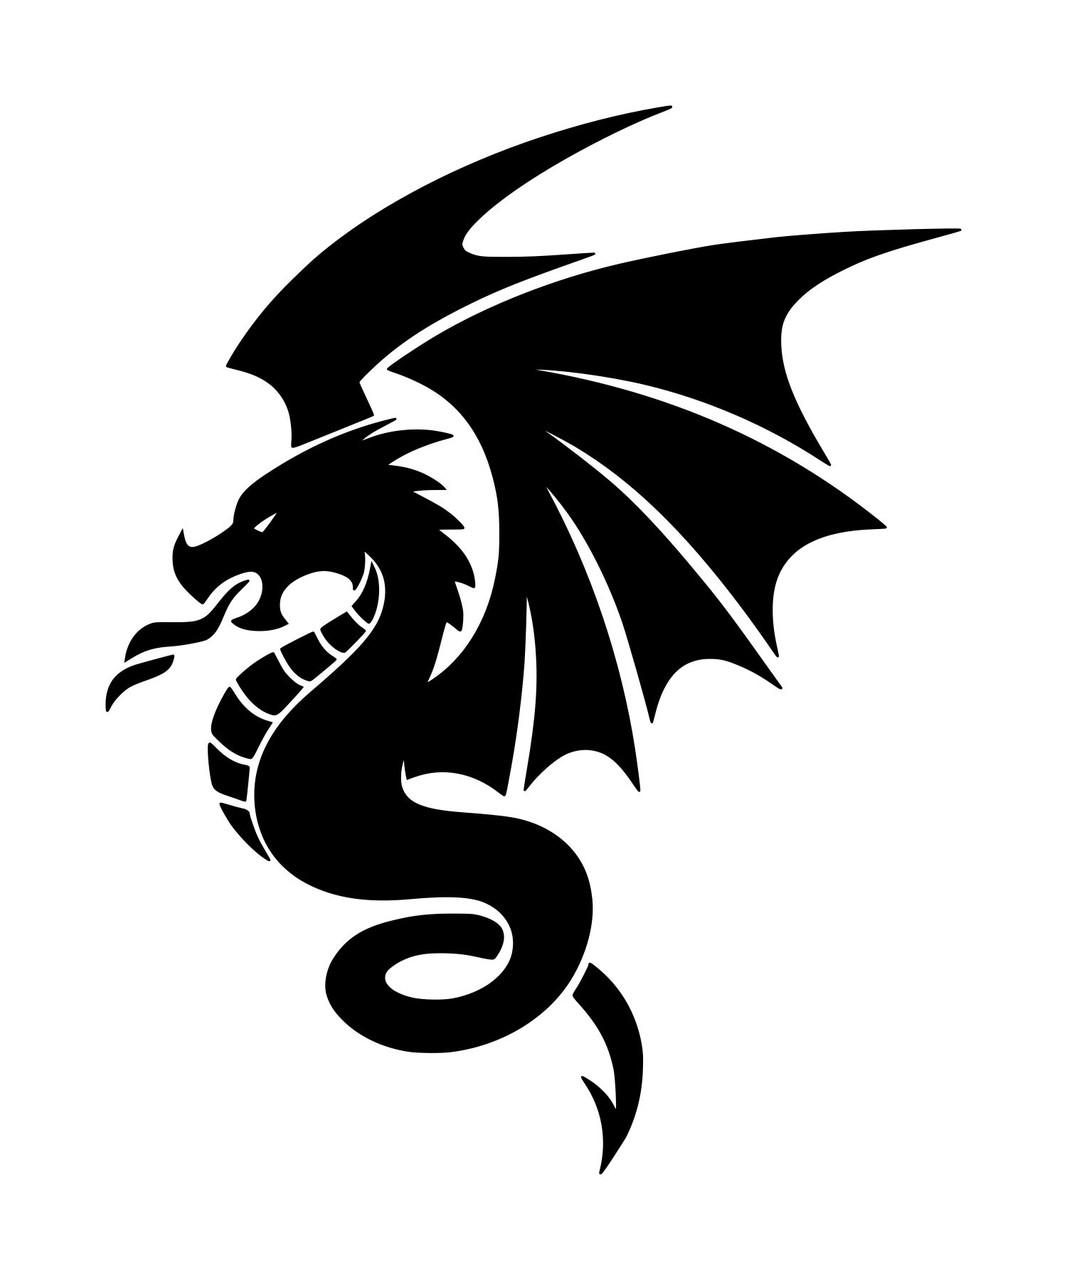 FLYING DRAGON Vinyl Decal Sticker -V1- Wyvern Medieval Fantasy Gaming